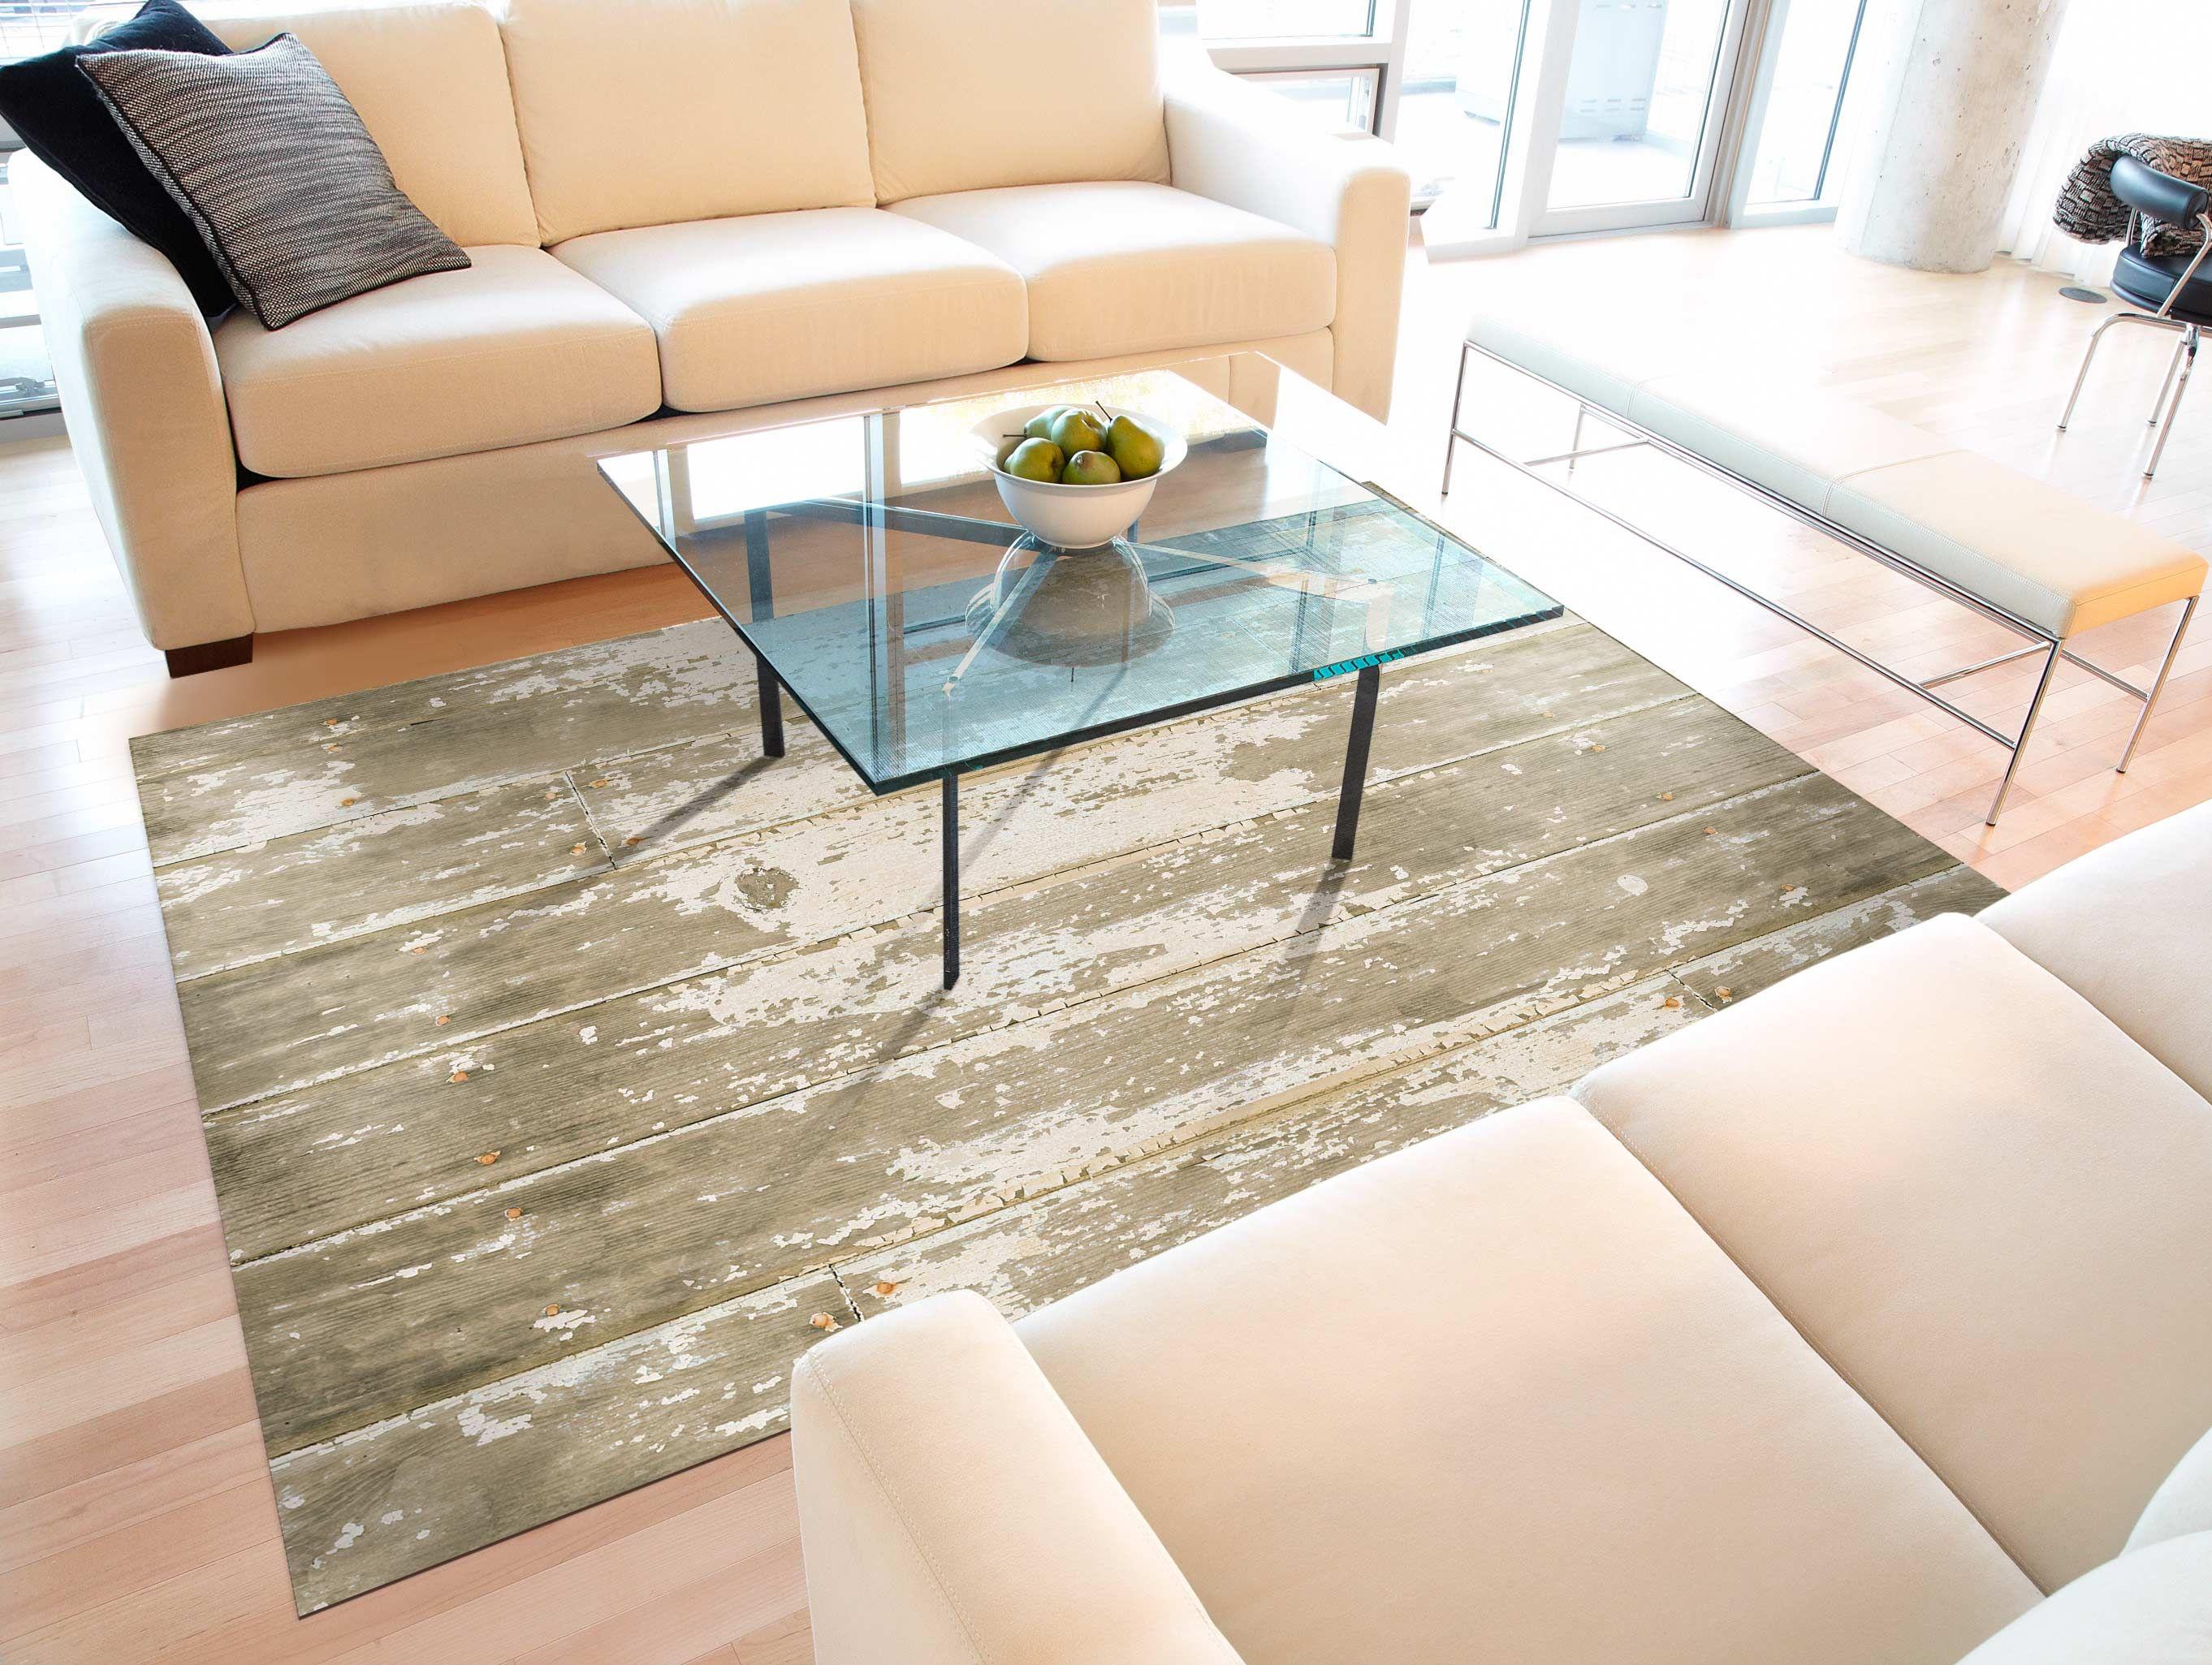 Bungalow Flooring Barnboard Mat - http://www.amazon.com/Bungalow-Flooring-FoFlor-66-Inch-Barnboard/dp/B002HWRGBA